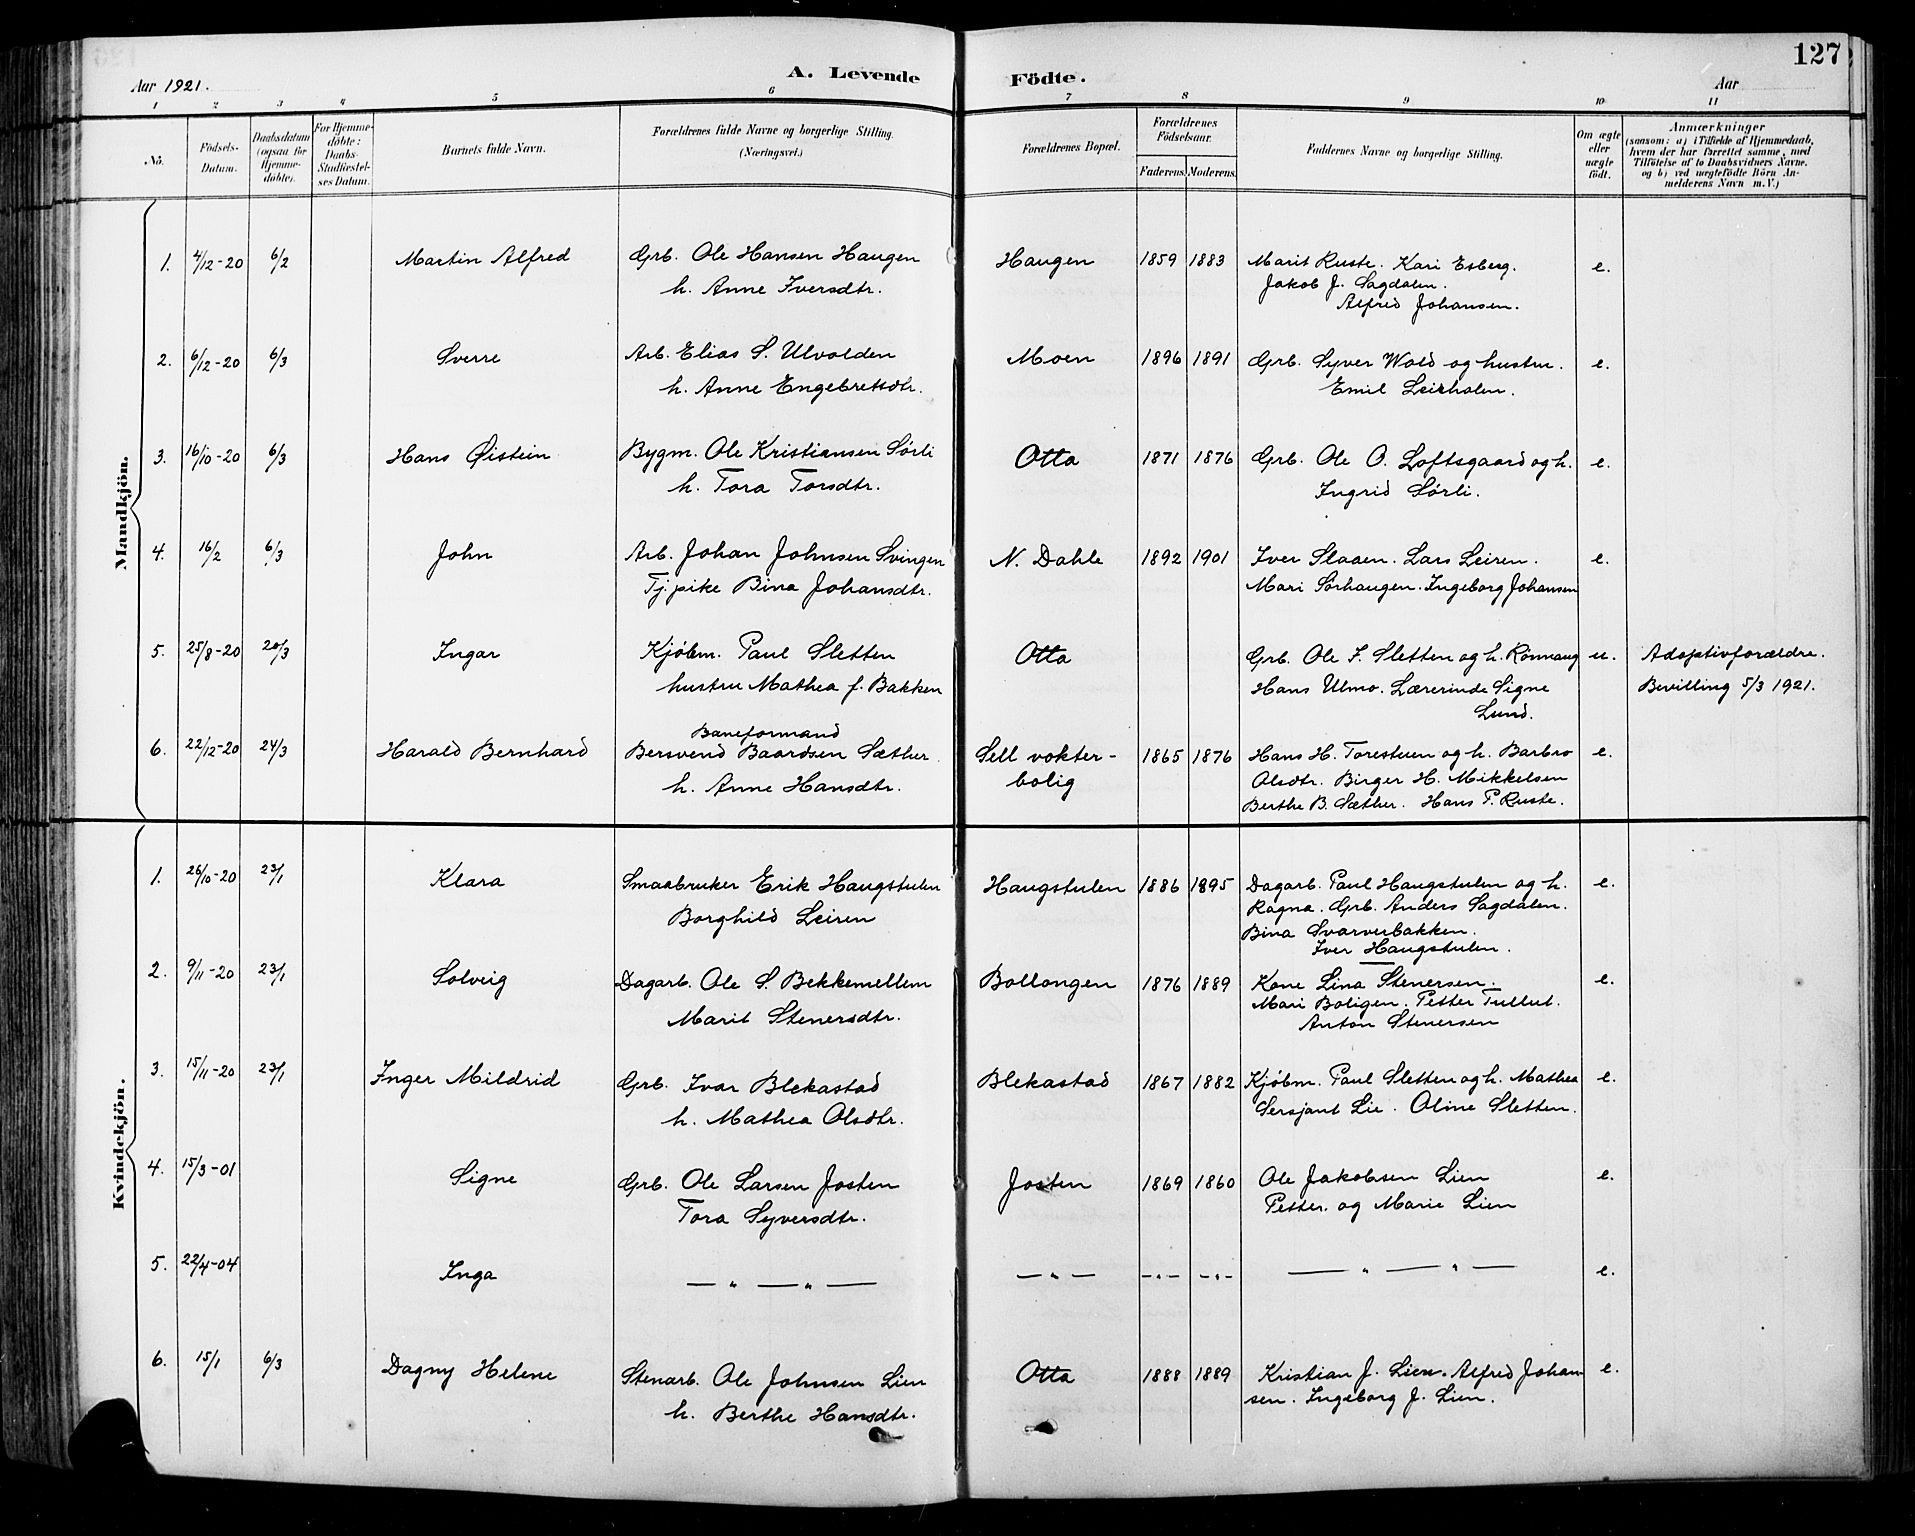 SAH, Sel prestekontor, Klokkerbok nr. 1, 1894-1923, s. 127